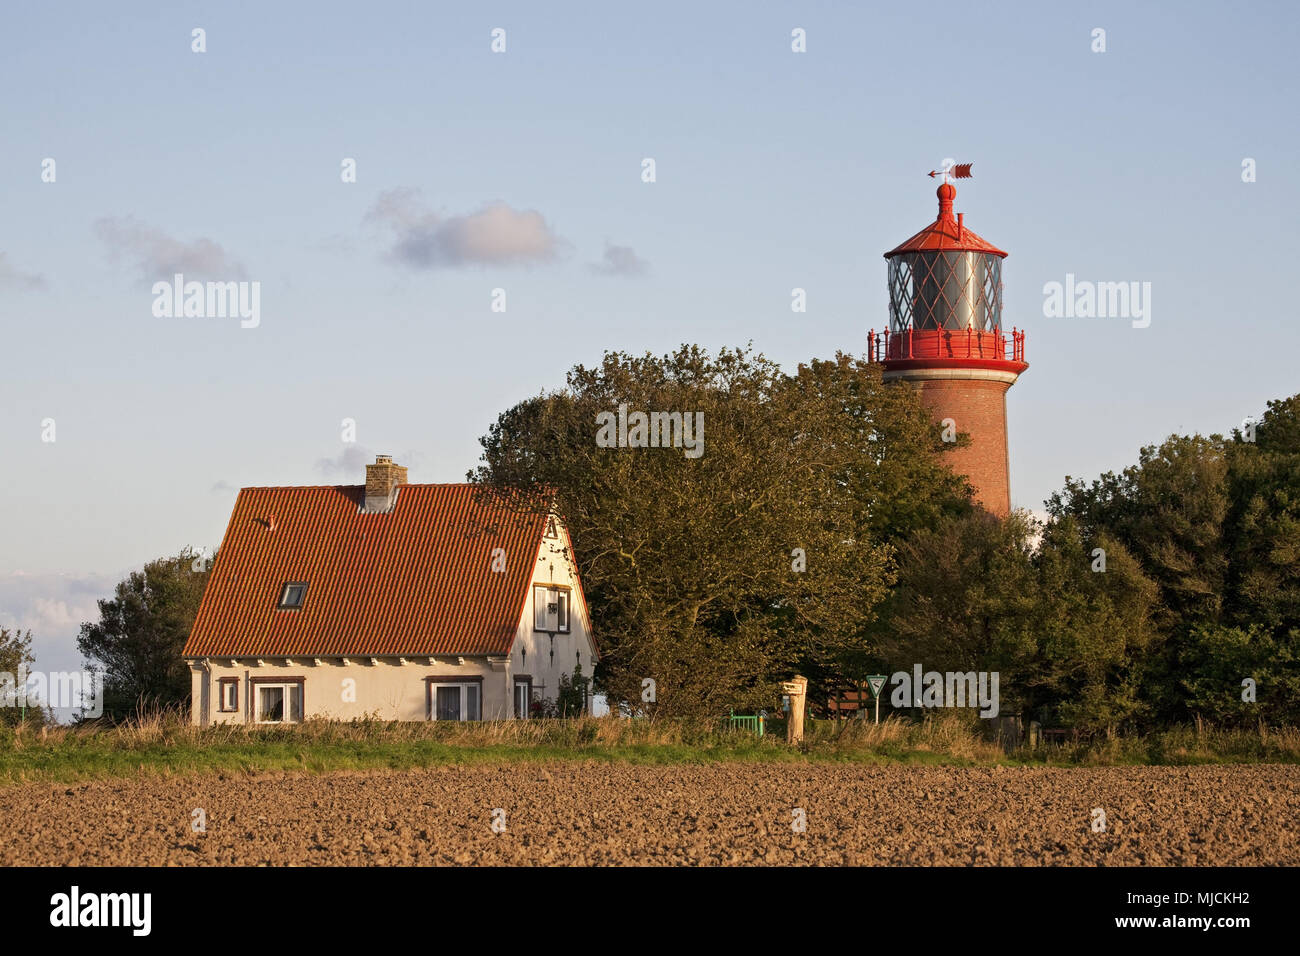 Lighthouse Staberhuk, island Fehmarn, Schleswig - Holstein, North Germany, Germany, Stock Photo